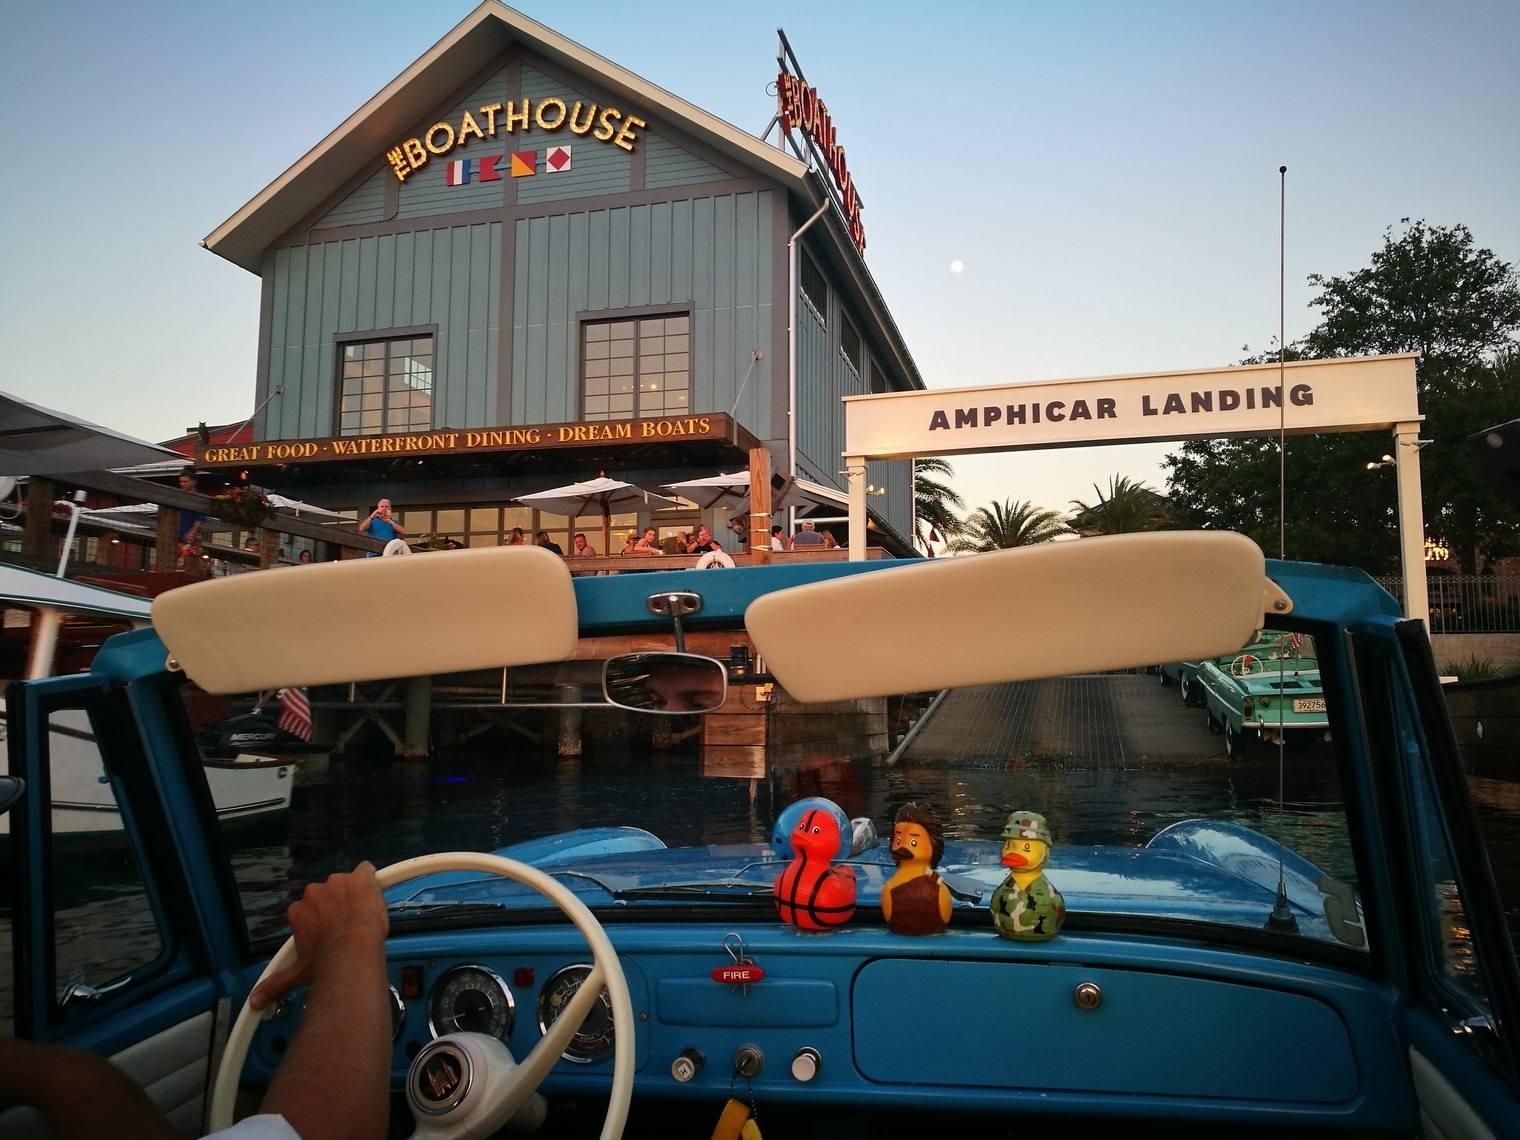 kissimmee_wild_florida_amphiboat_view (2)